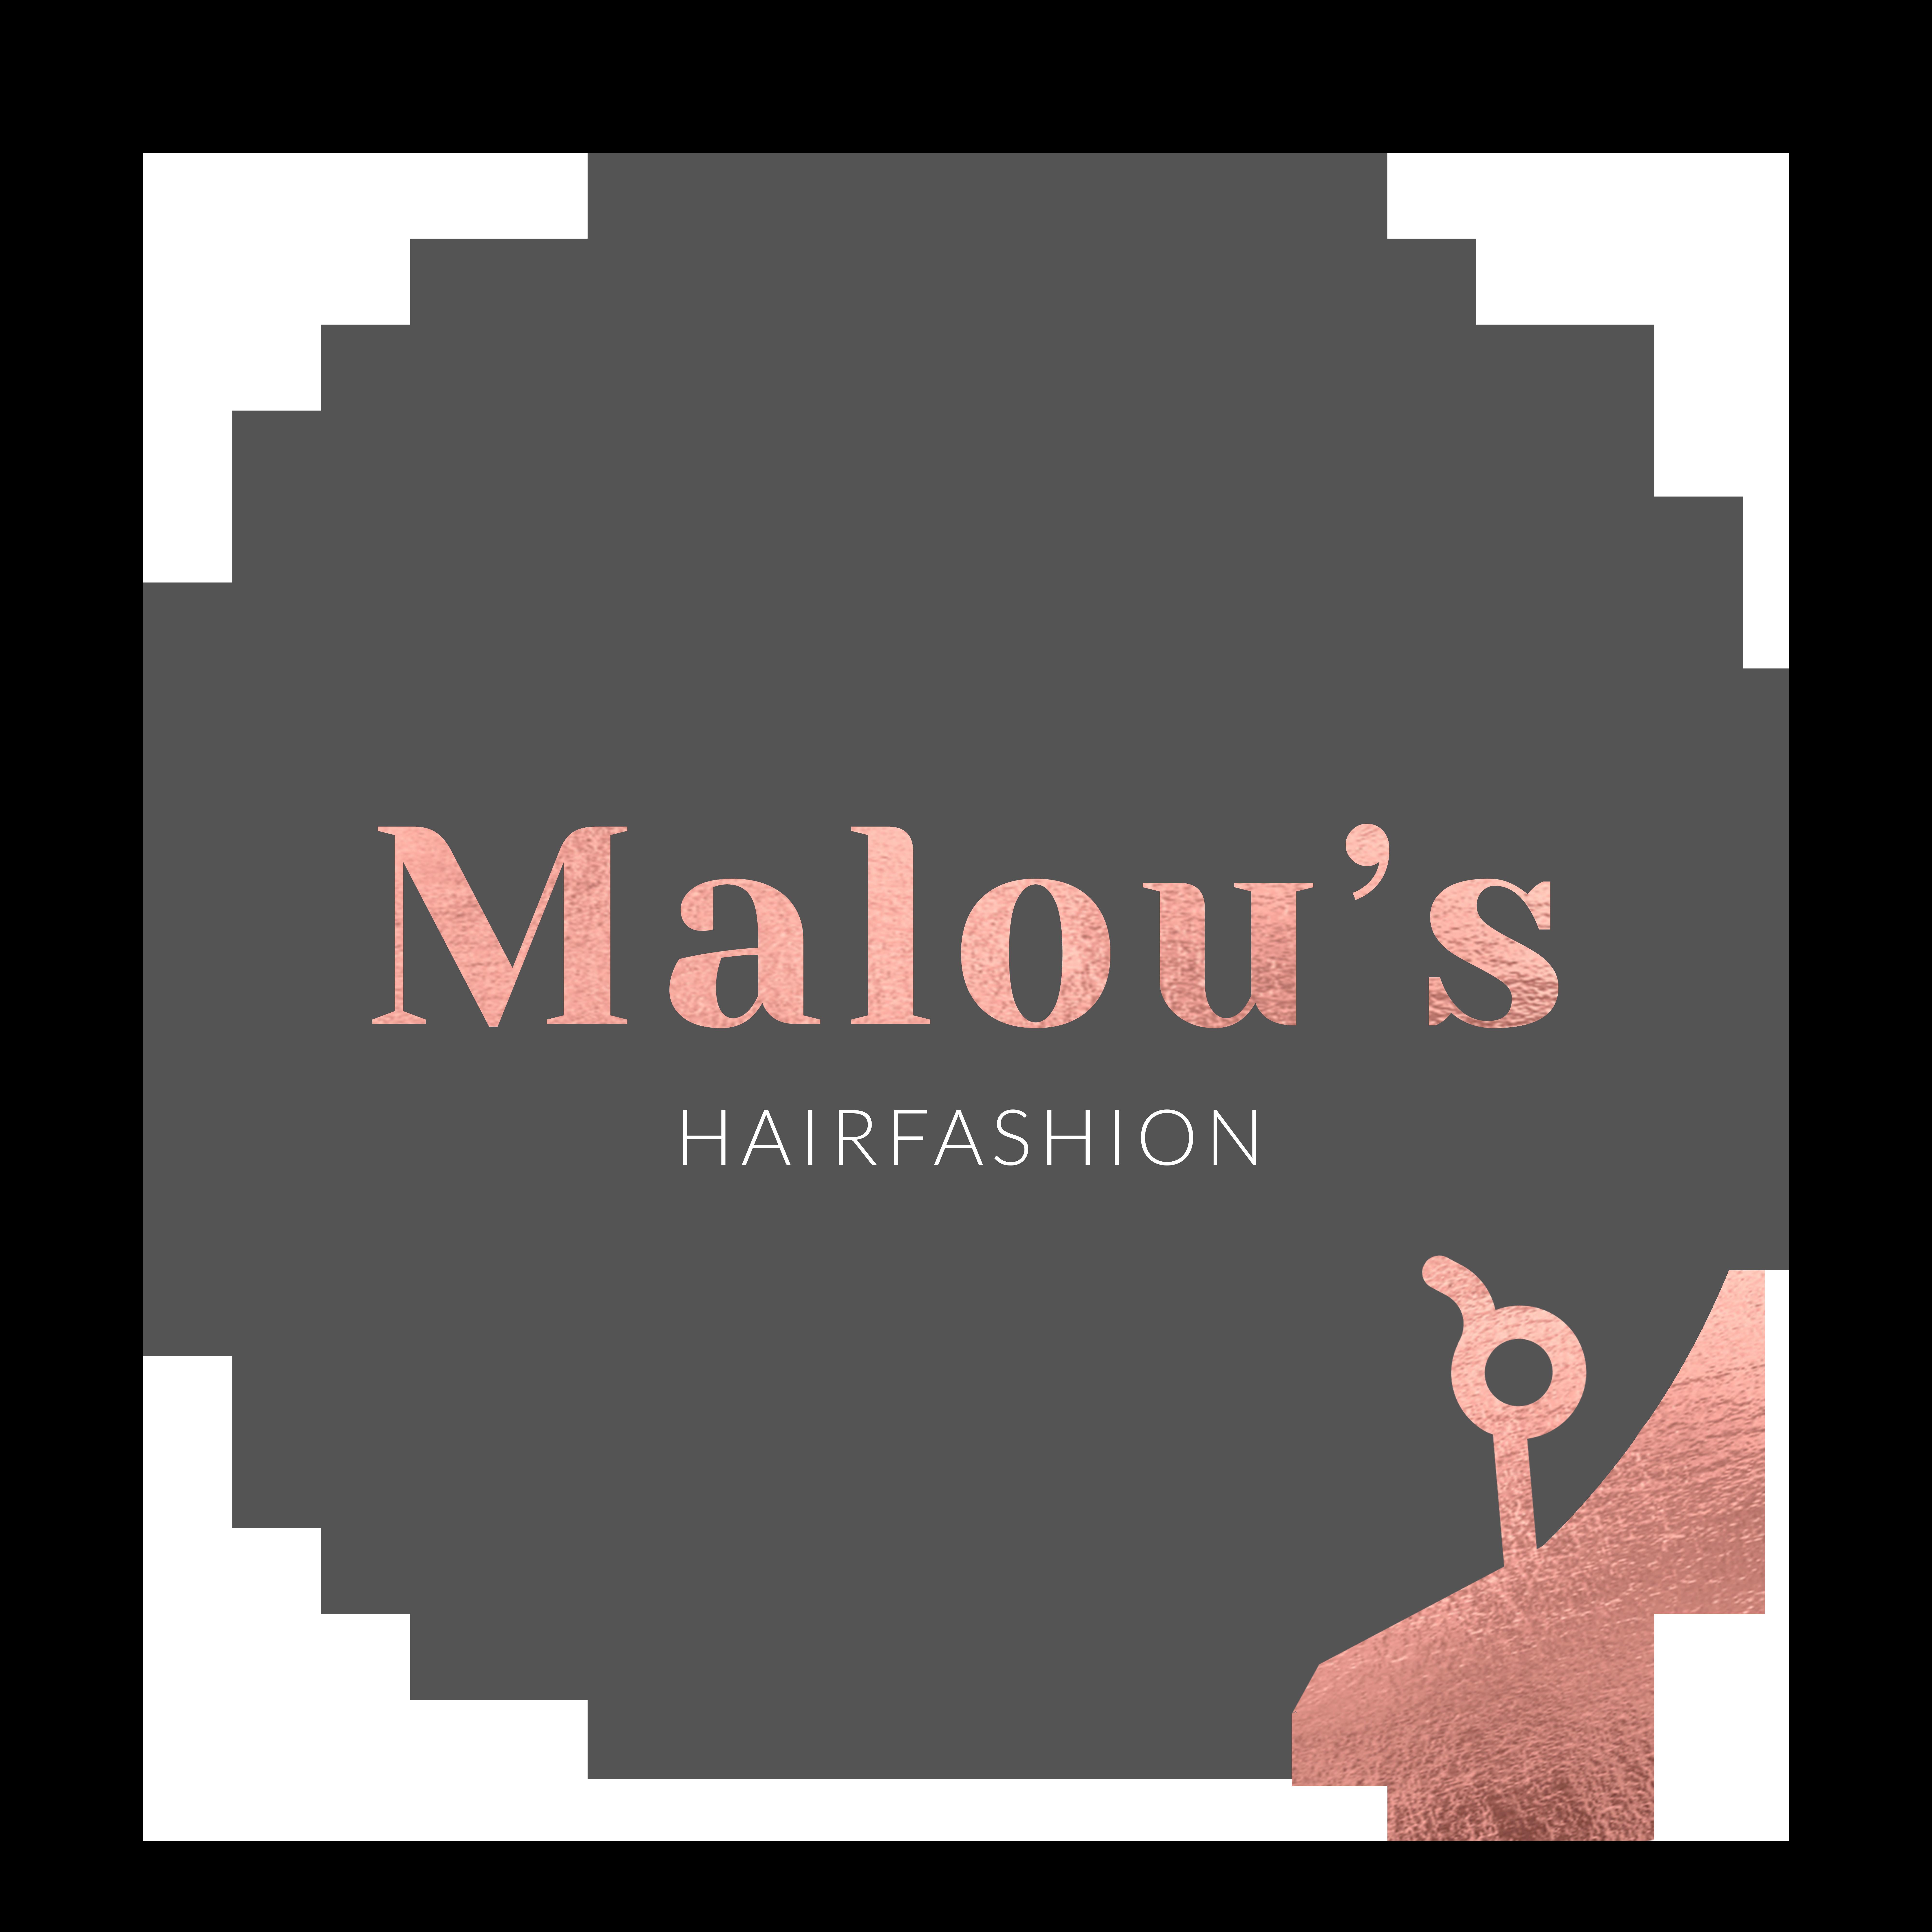 Malou's Hairfashion